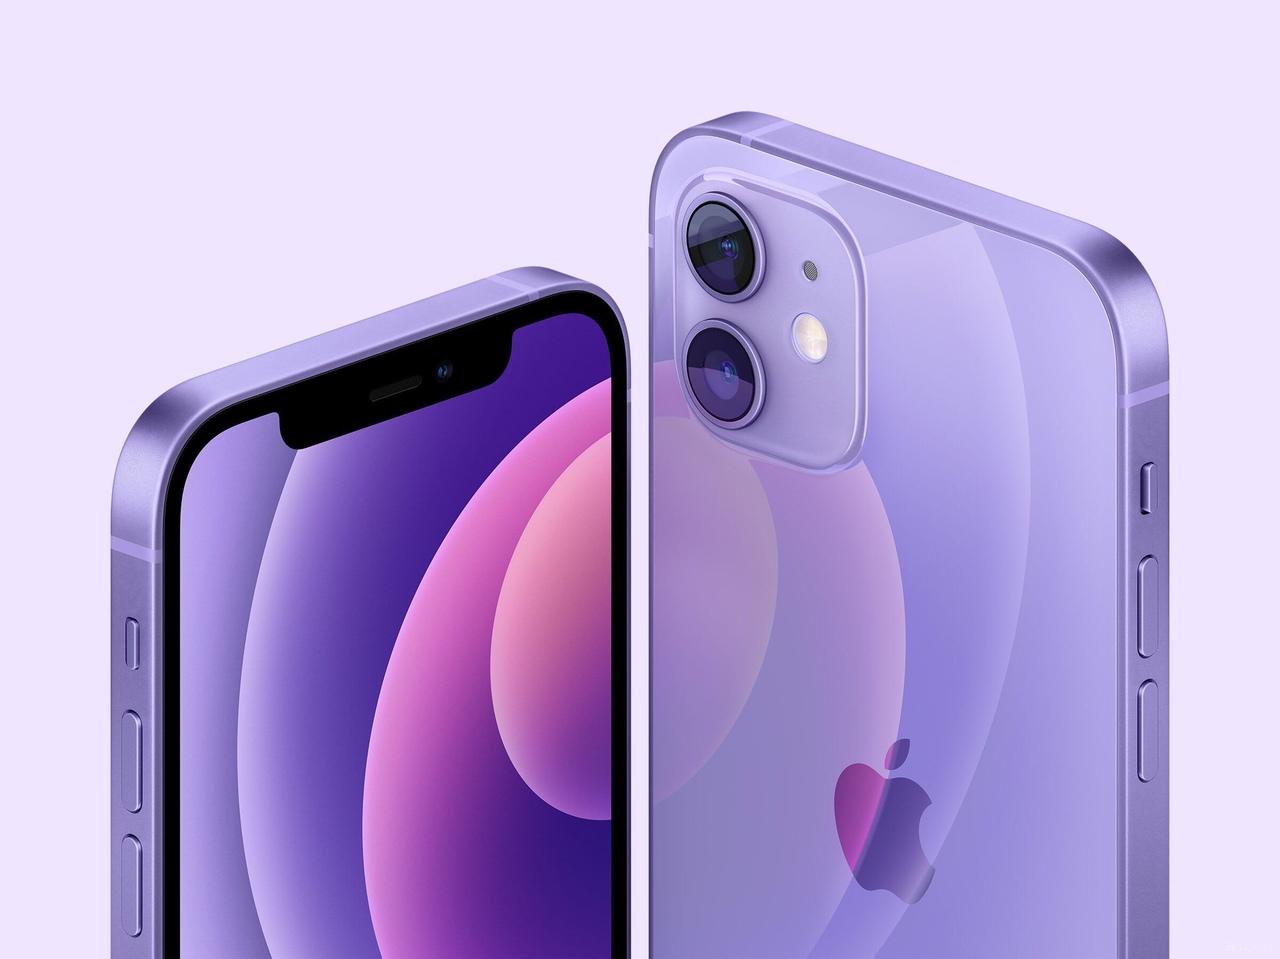 iPhone 12 в новом цвете Purple.